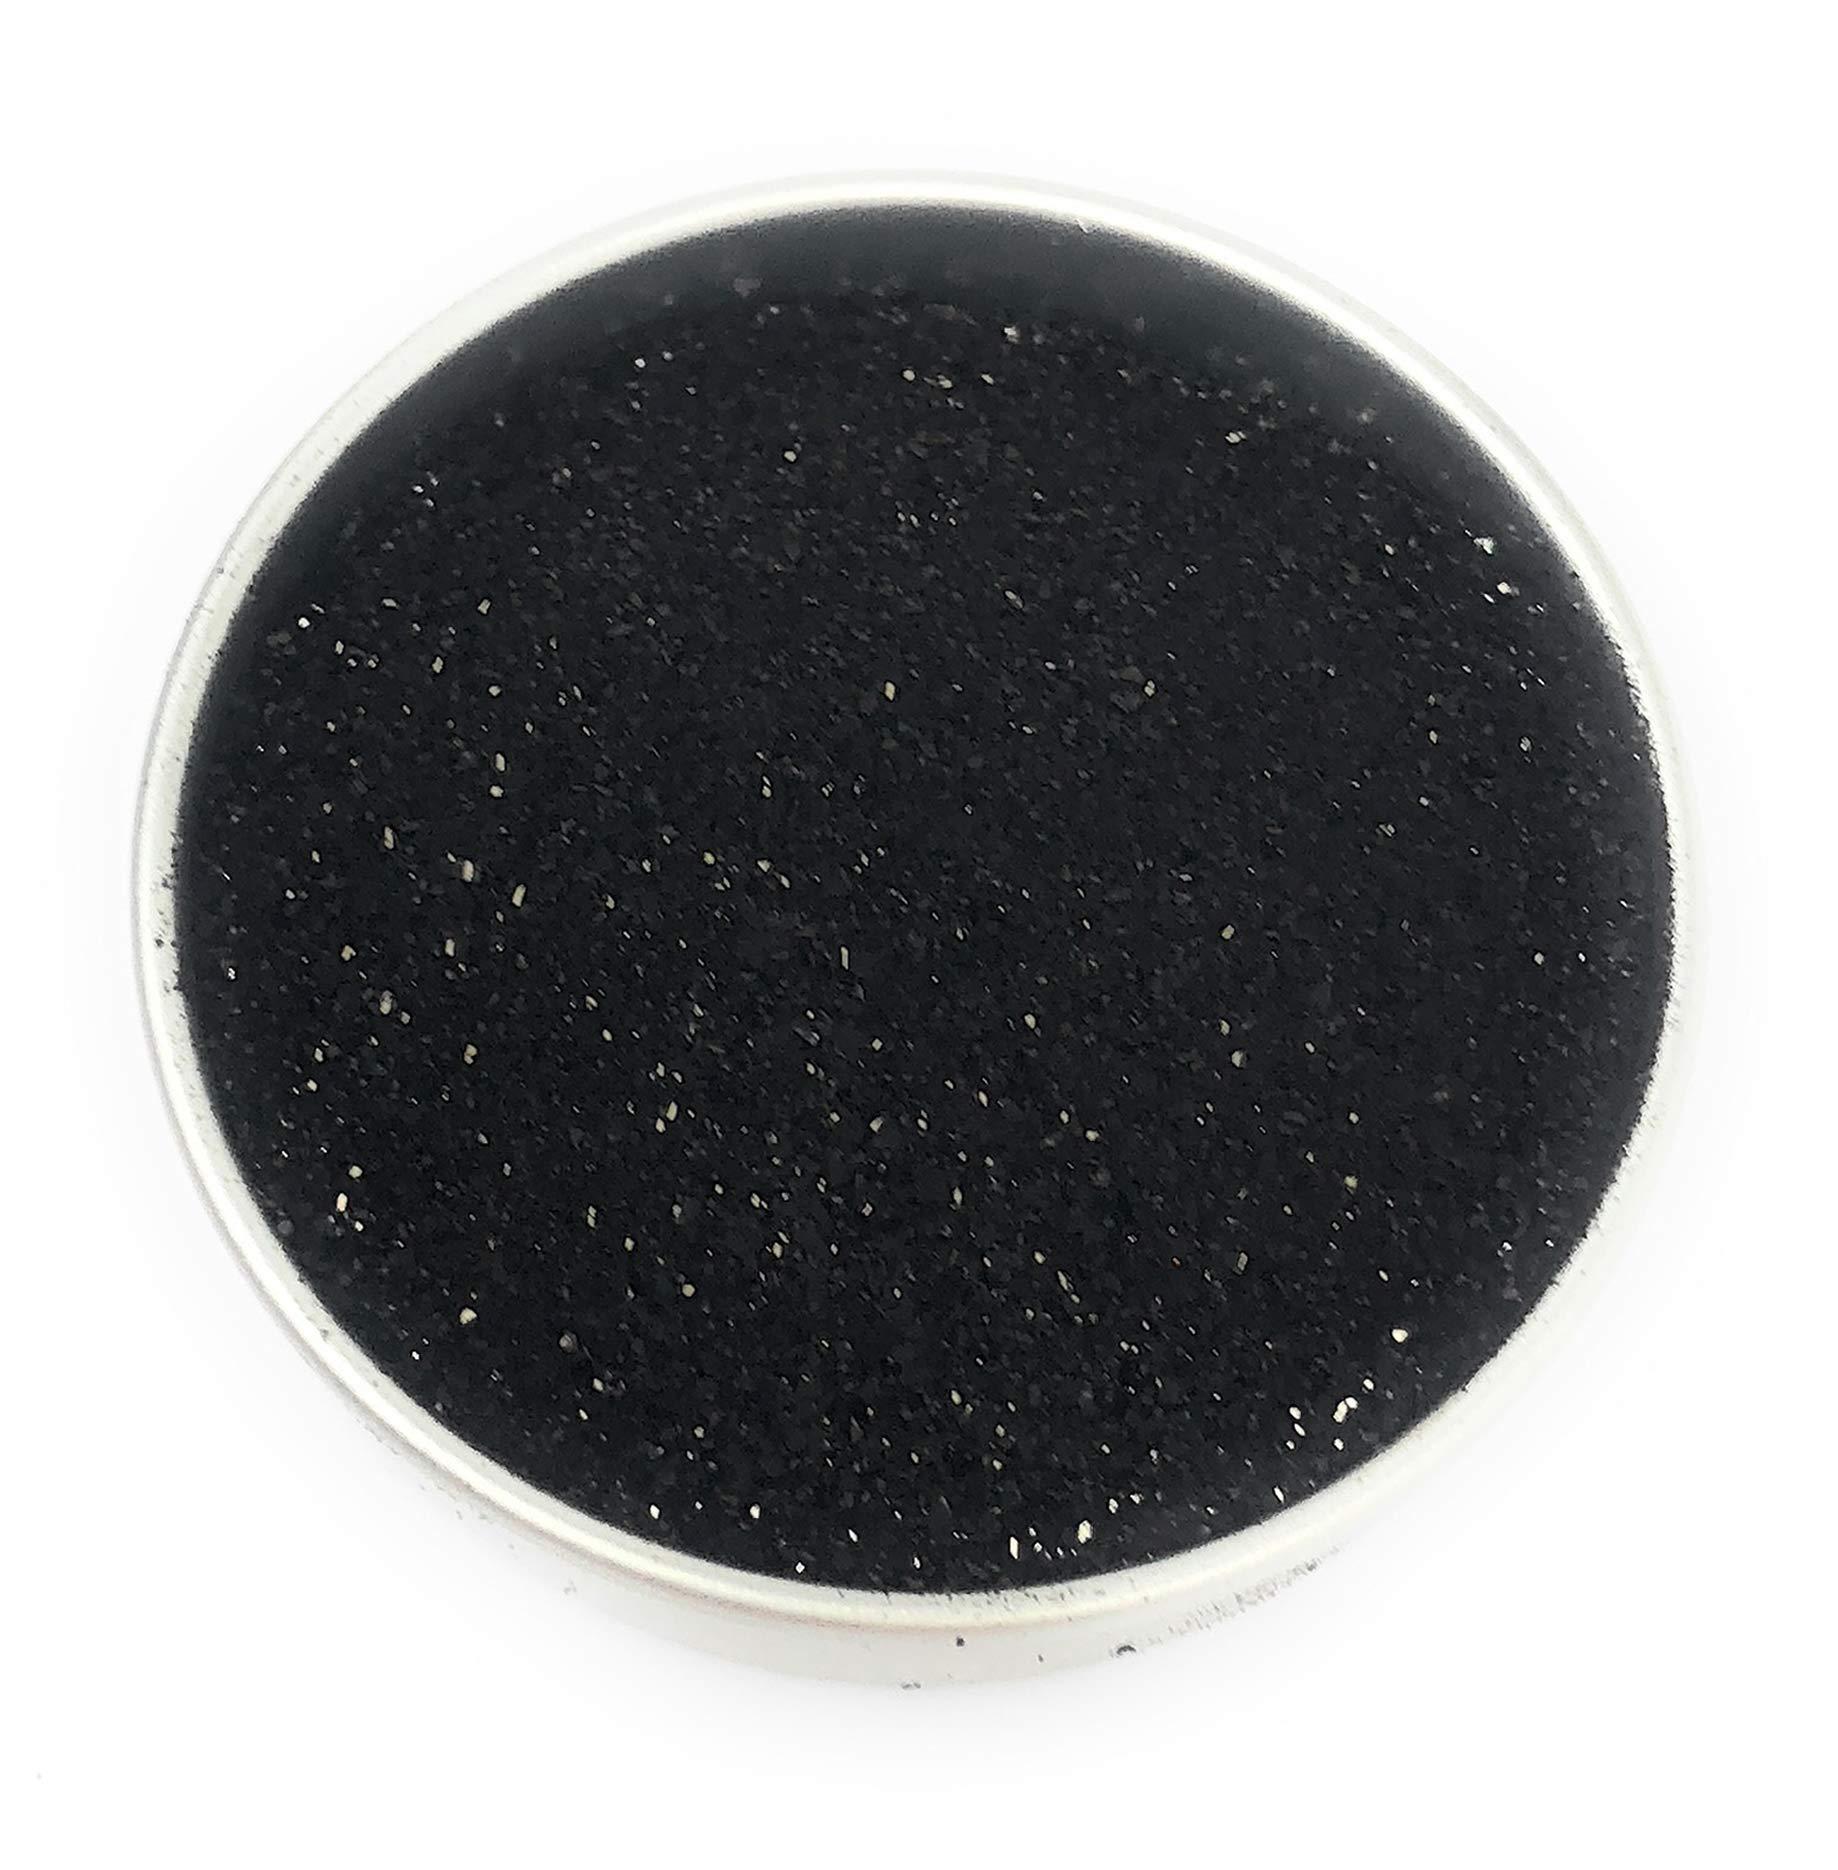 Ultimate Baker Black Petal Dust - Kosher Certified All Natural Matte Black Dusting Powder (1oz Black Cake Dust)